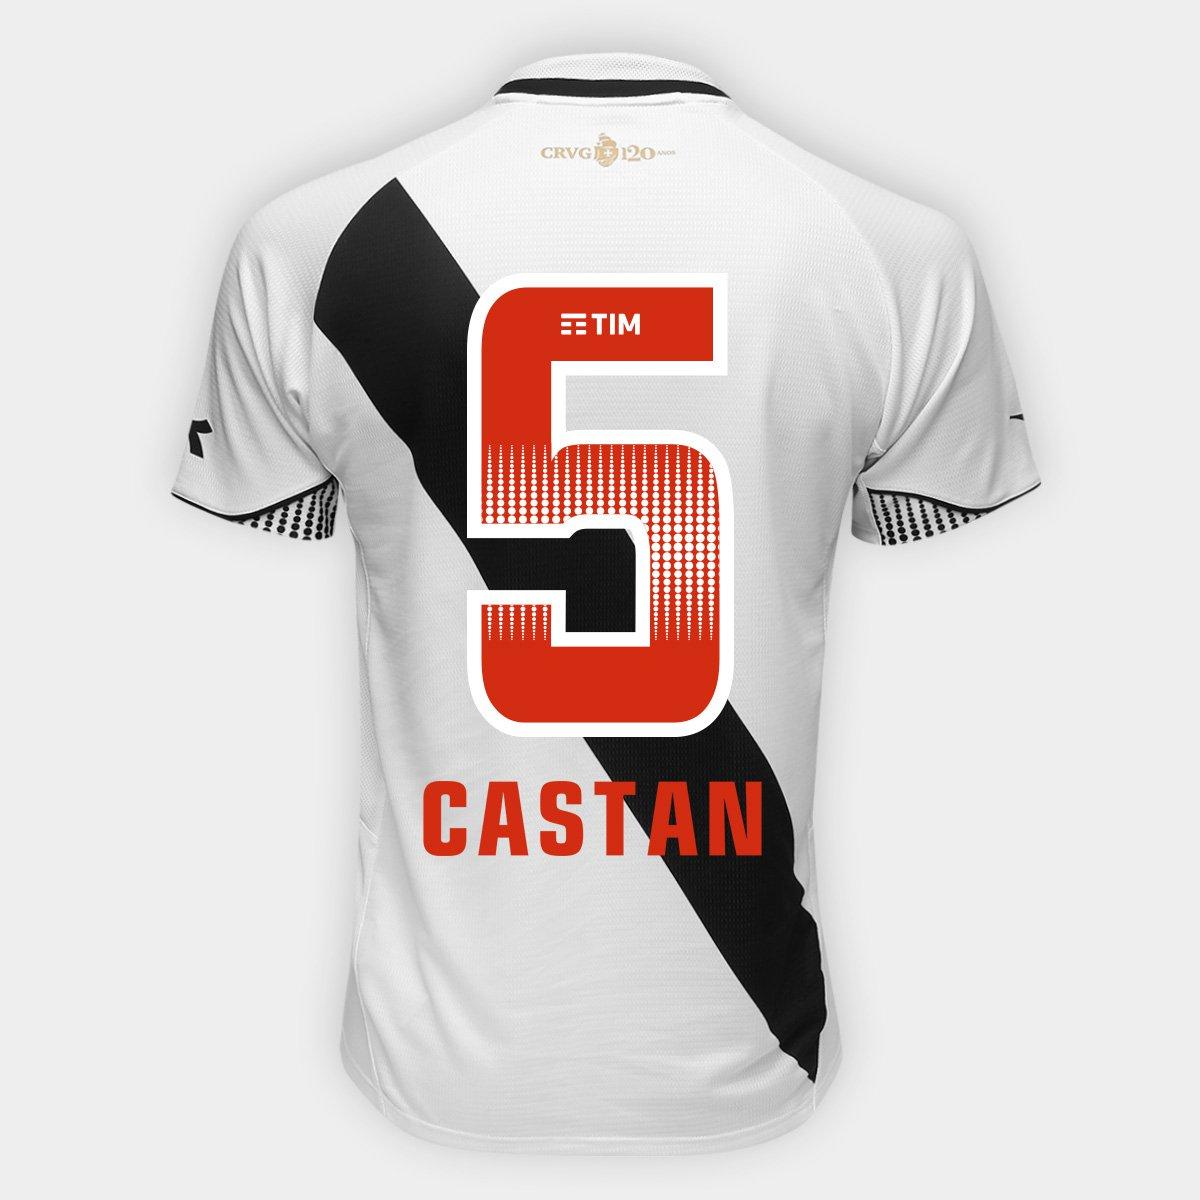 a9df714c937a0 Camisa Vasco II 2018 Nº 5 - Castán - Torcedor Diadora Masculina - Branco -  Compre Agora